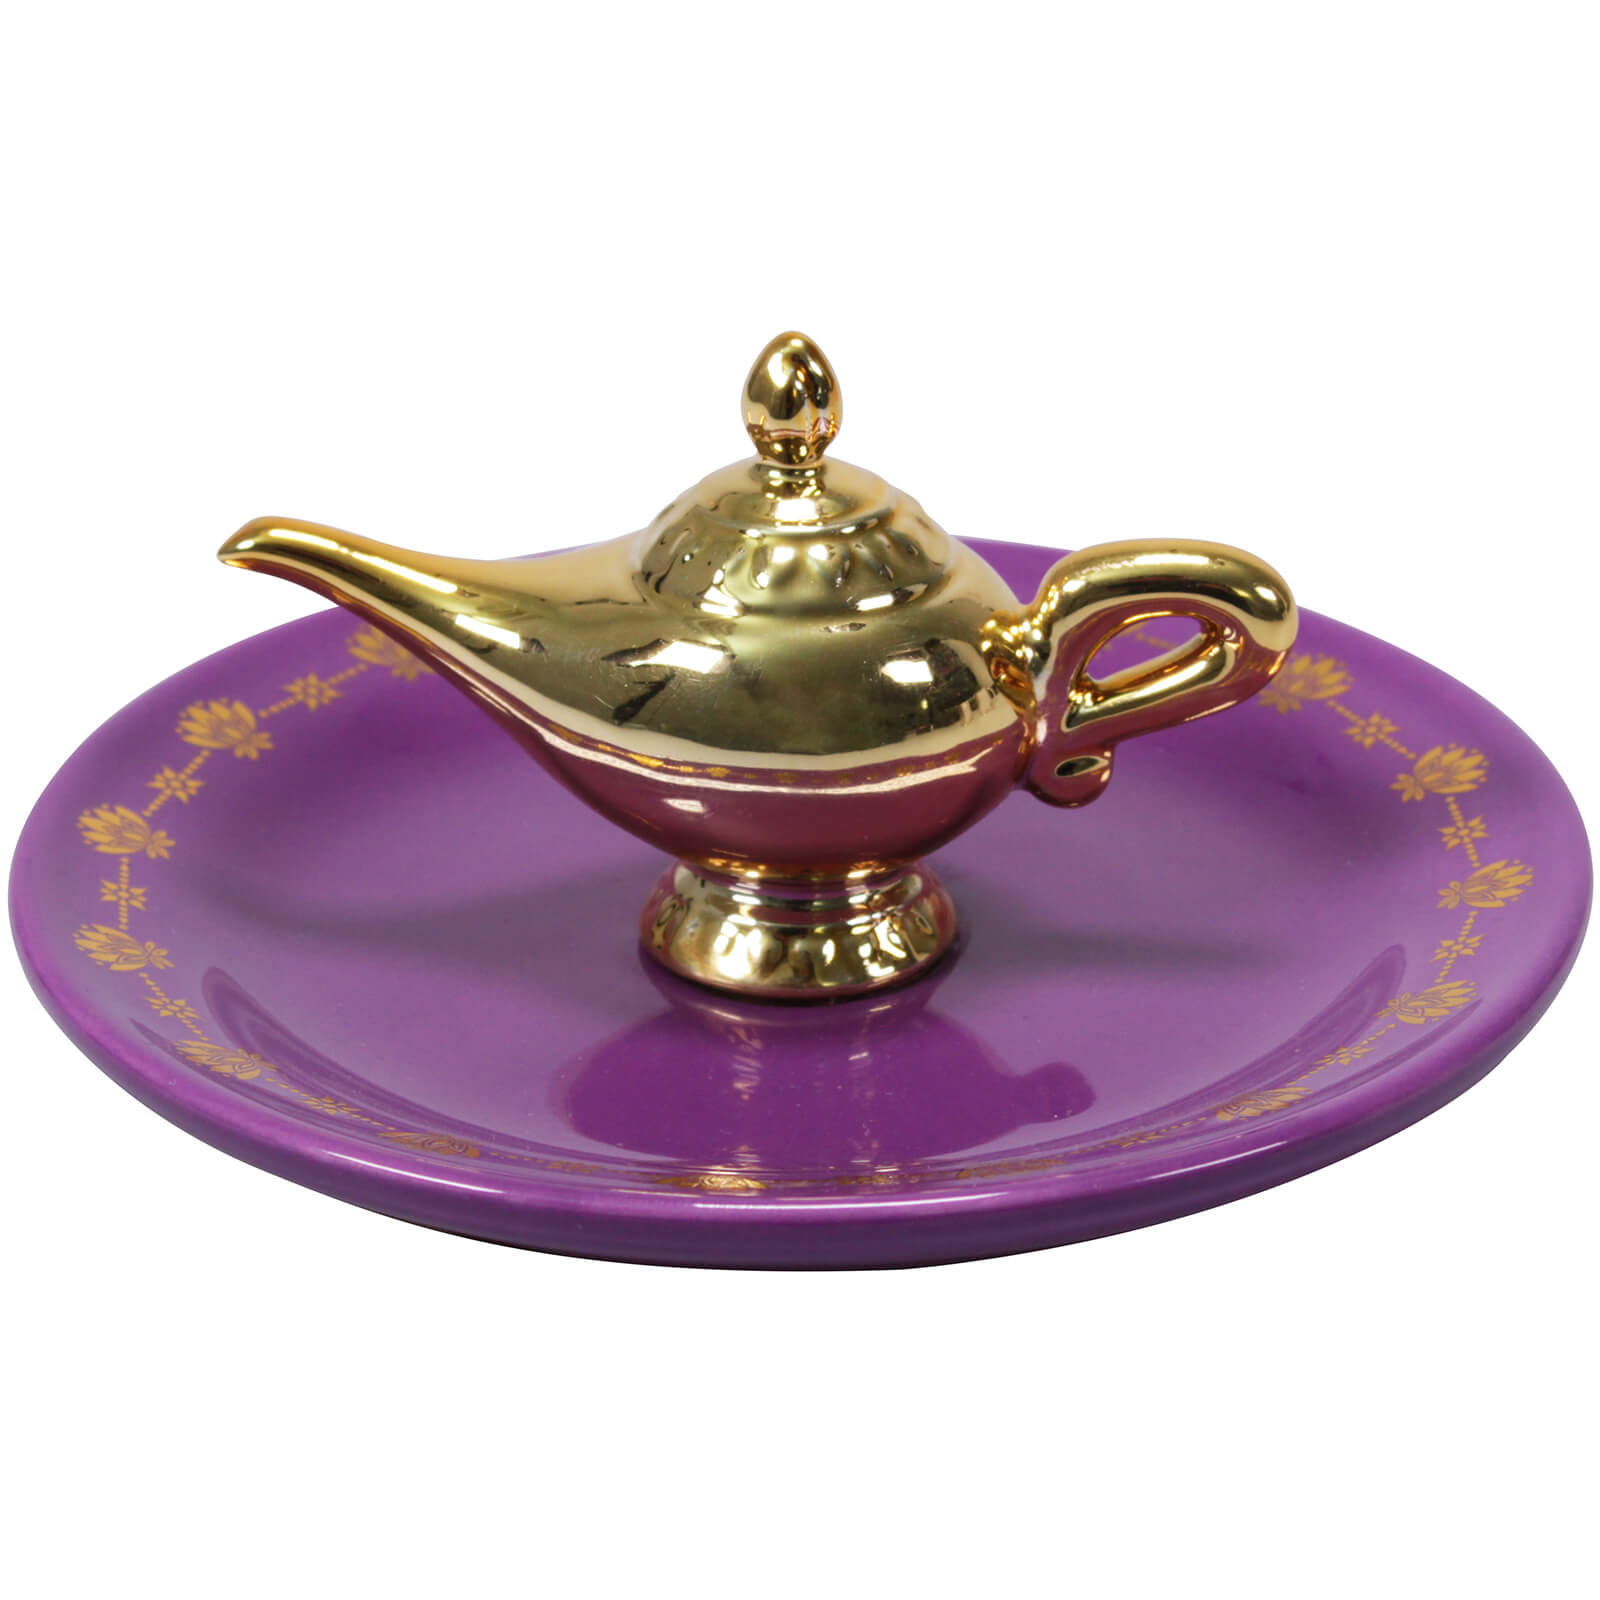 Image of Aladdin Lamp Accessory Dish